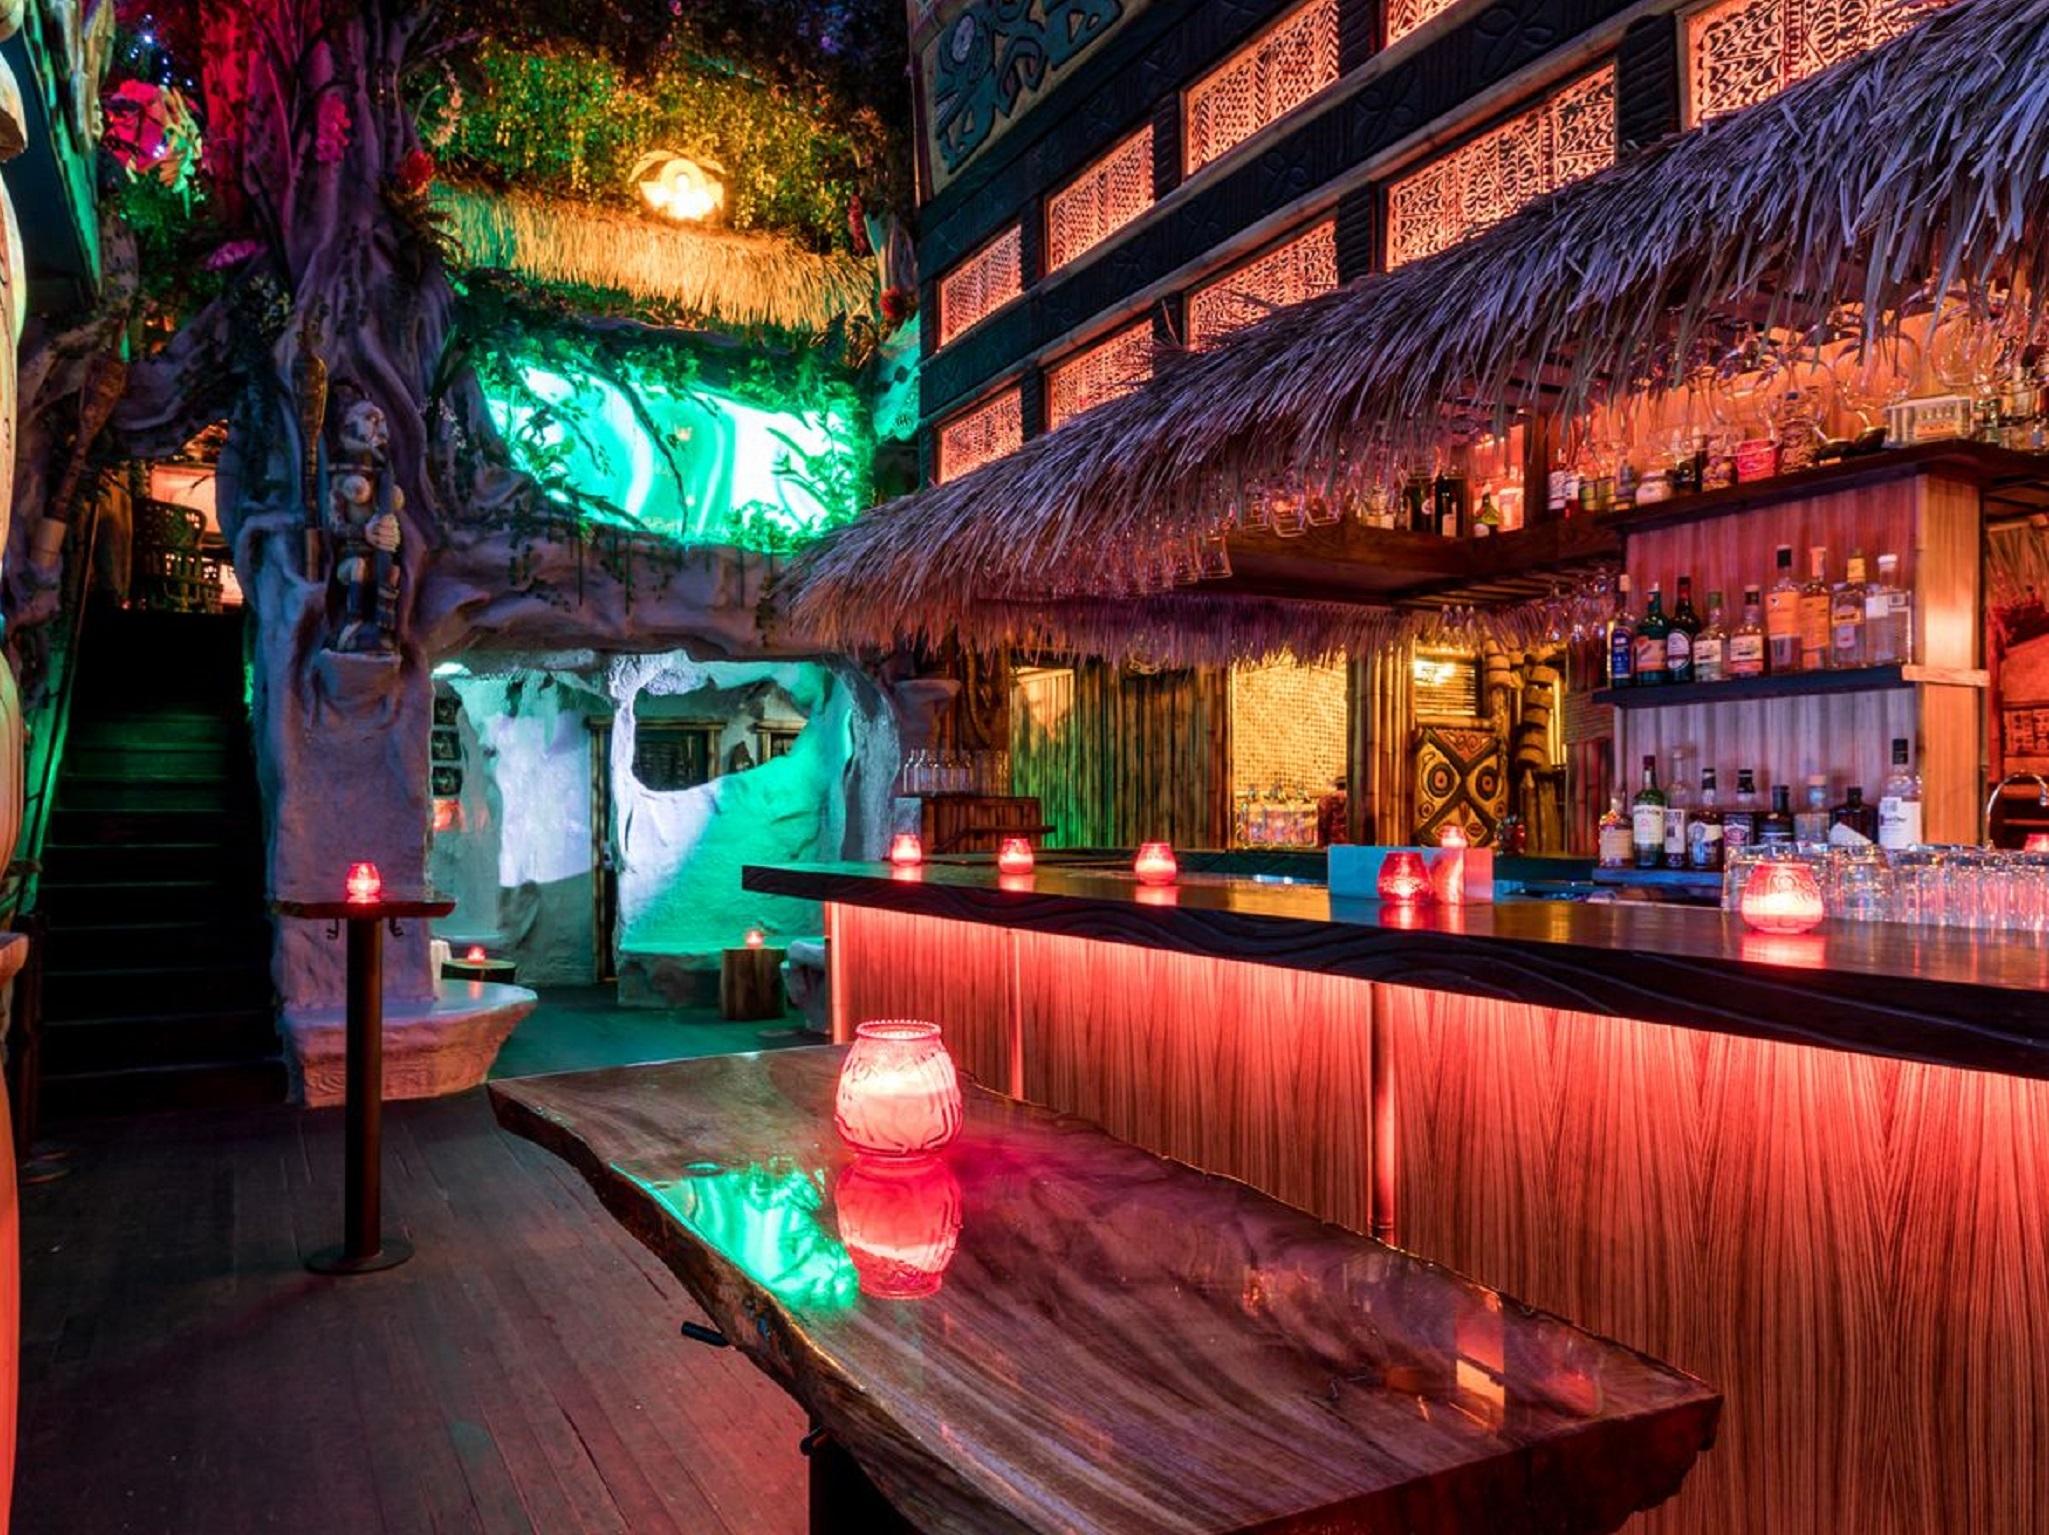 A colorful tiki bar